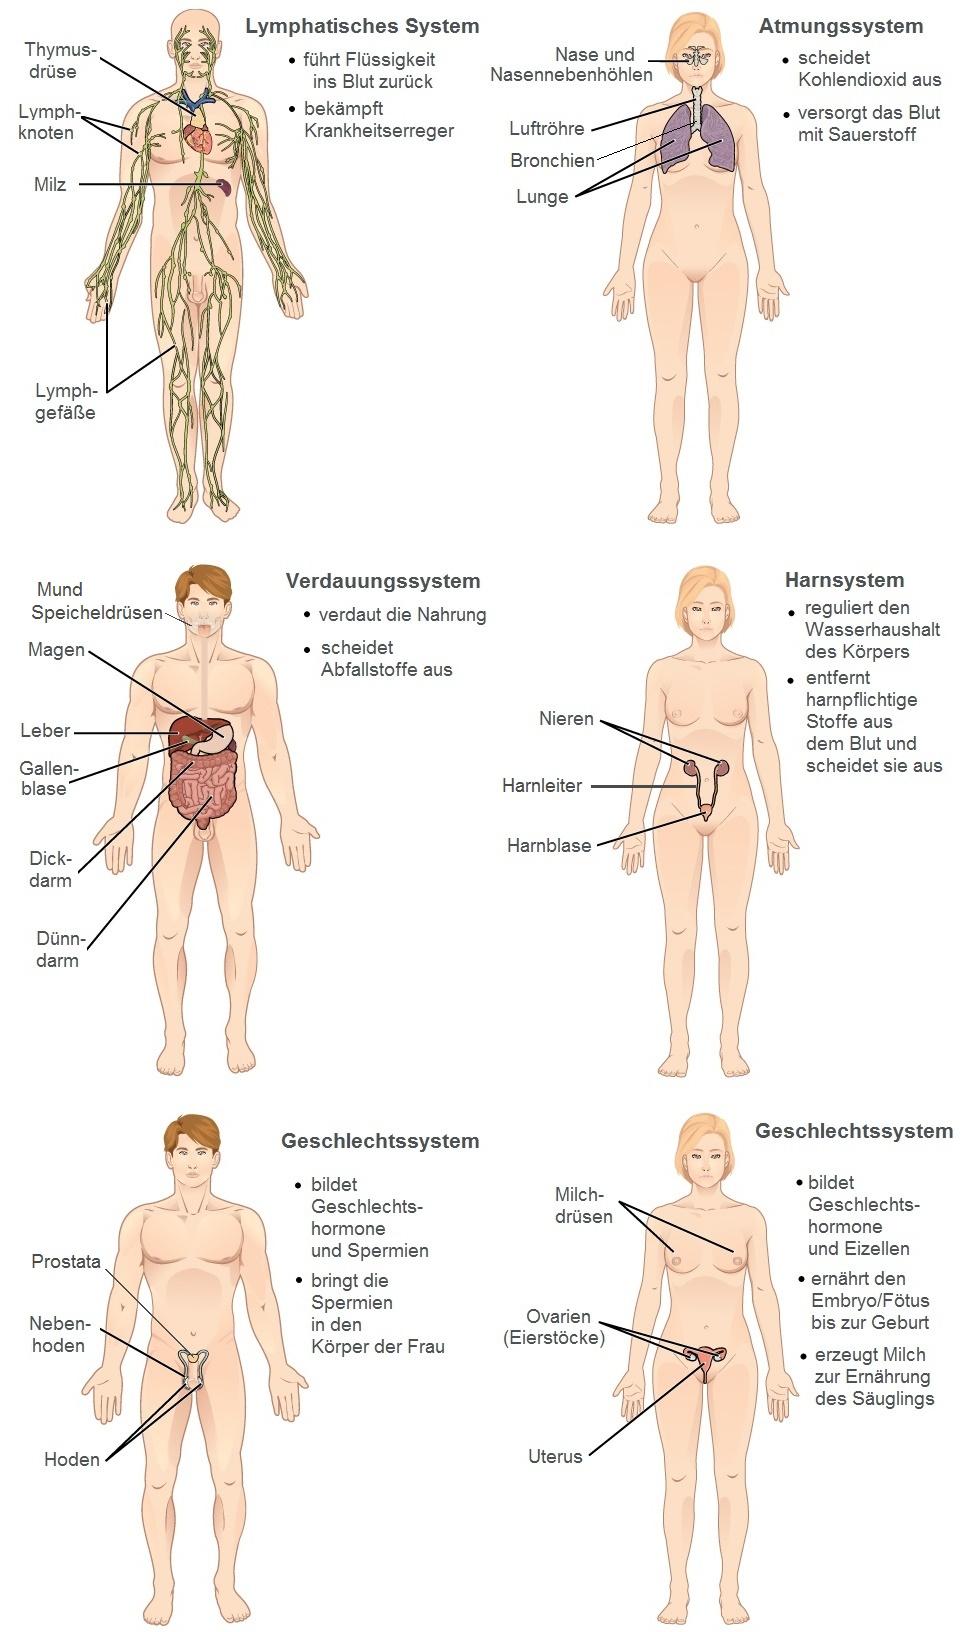 File:Organ Systeme 2.jpg - Wikimedia Commons